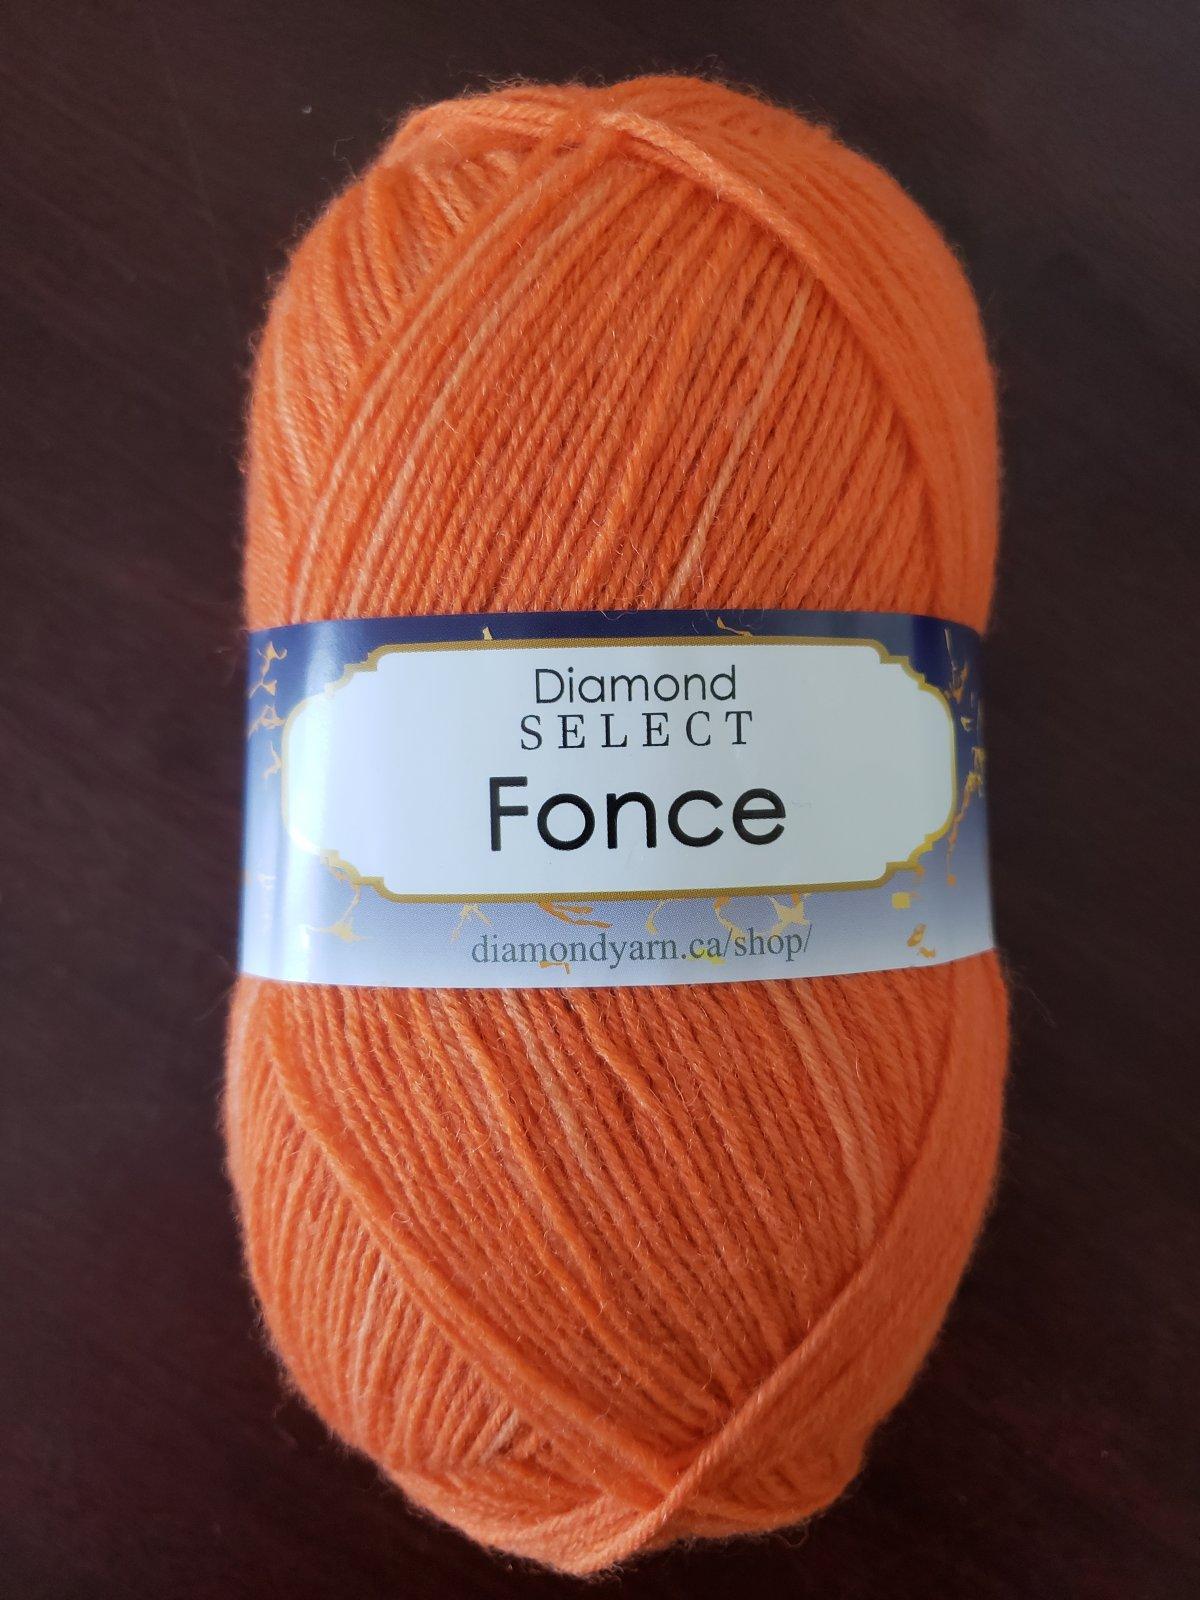 Diamond Yarns - Fonce